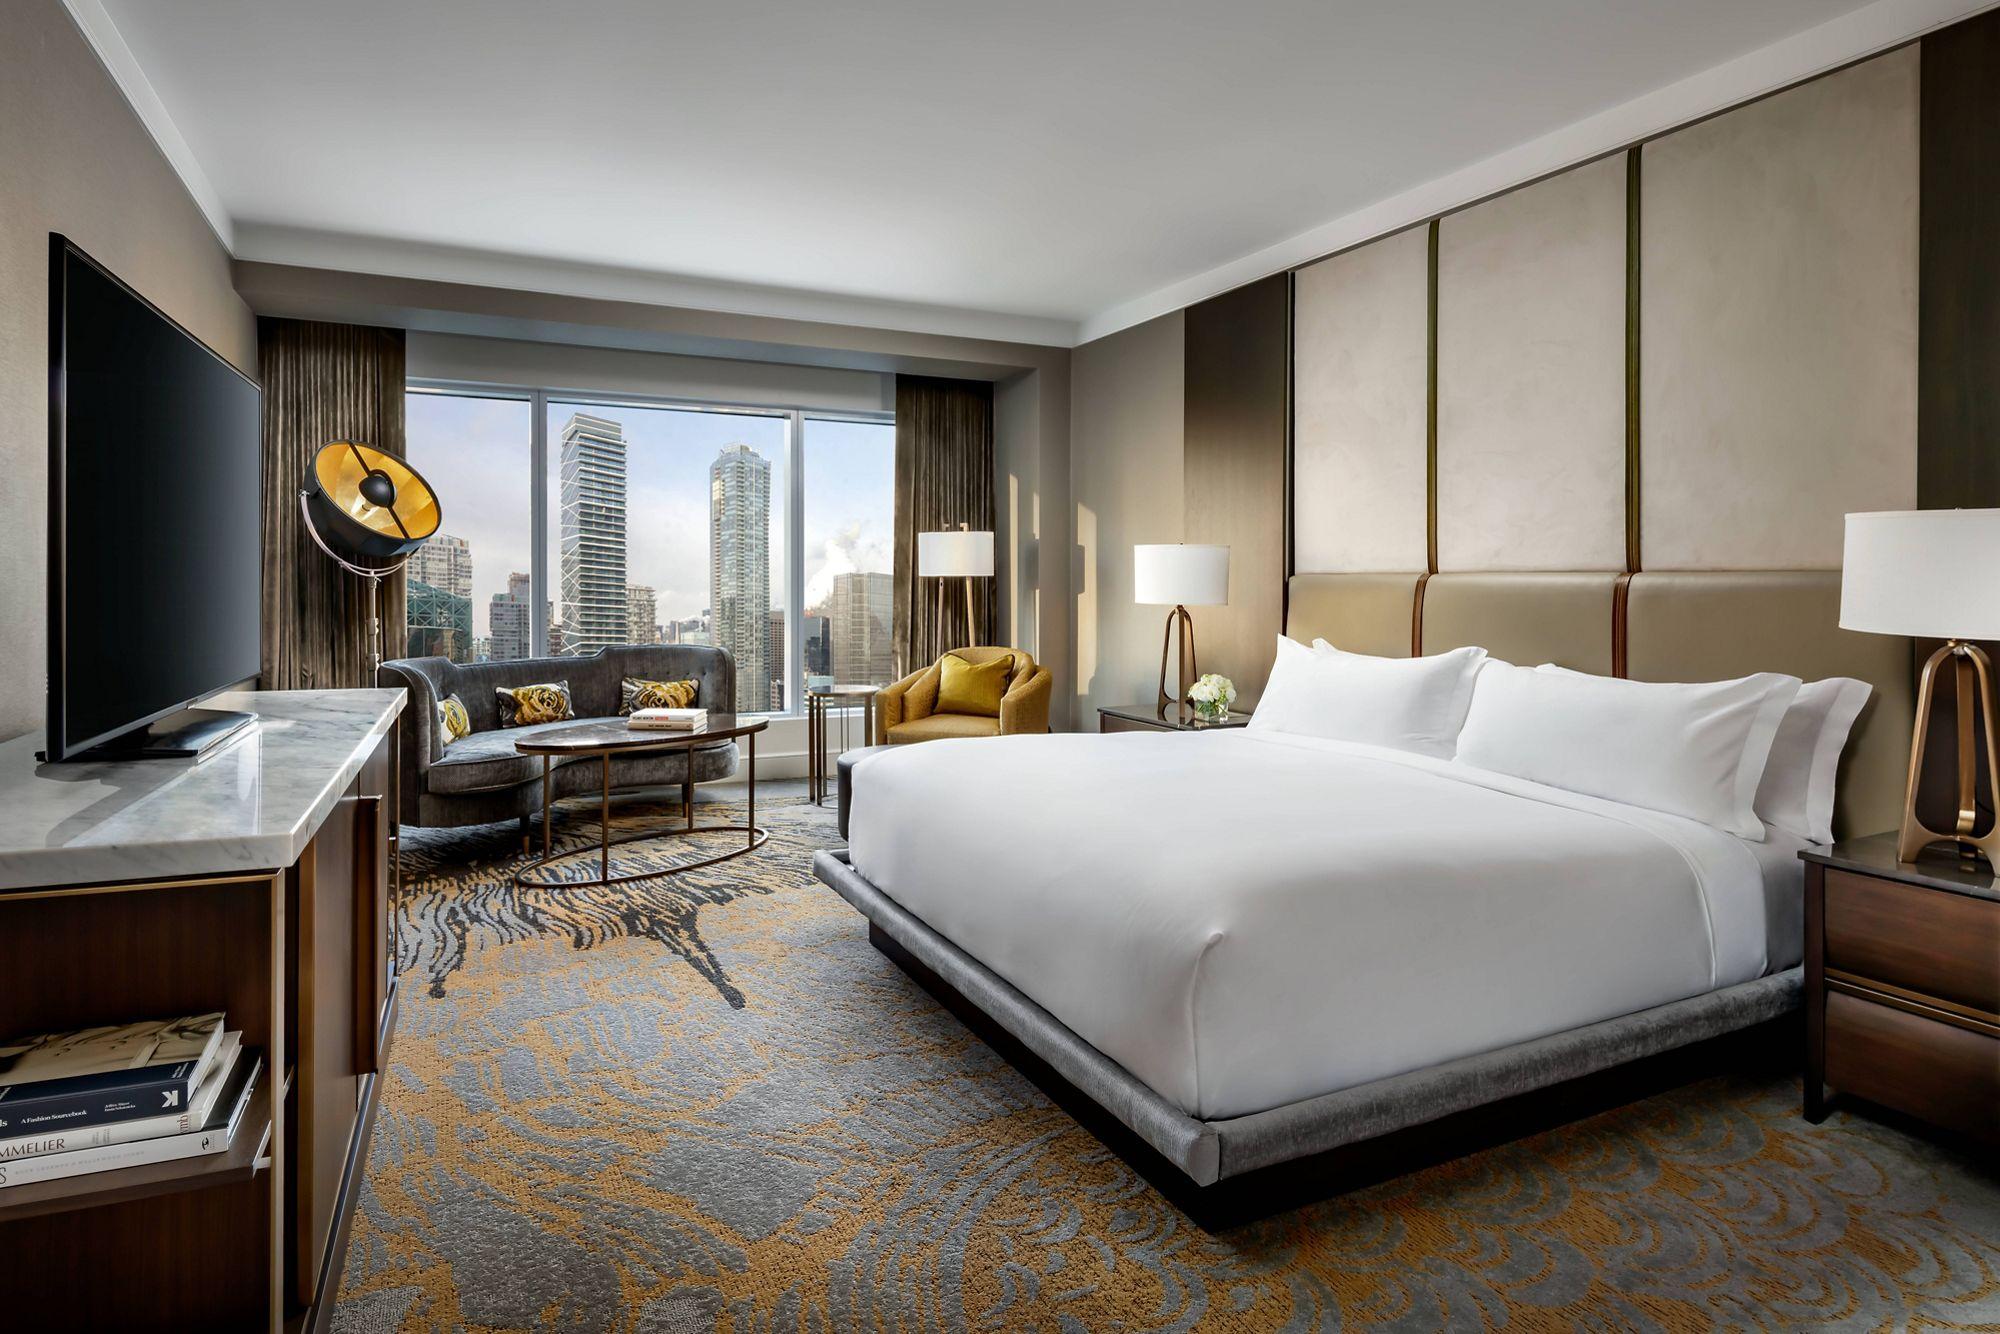 5 Star Hotels In Toronto Luxury Hotels Toronto Canada